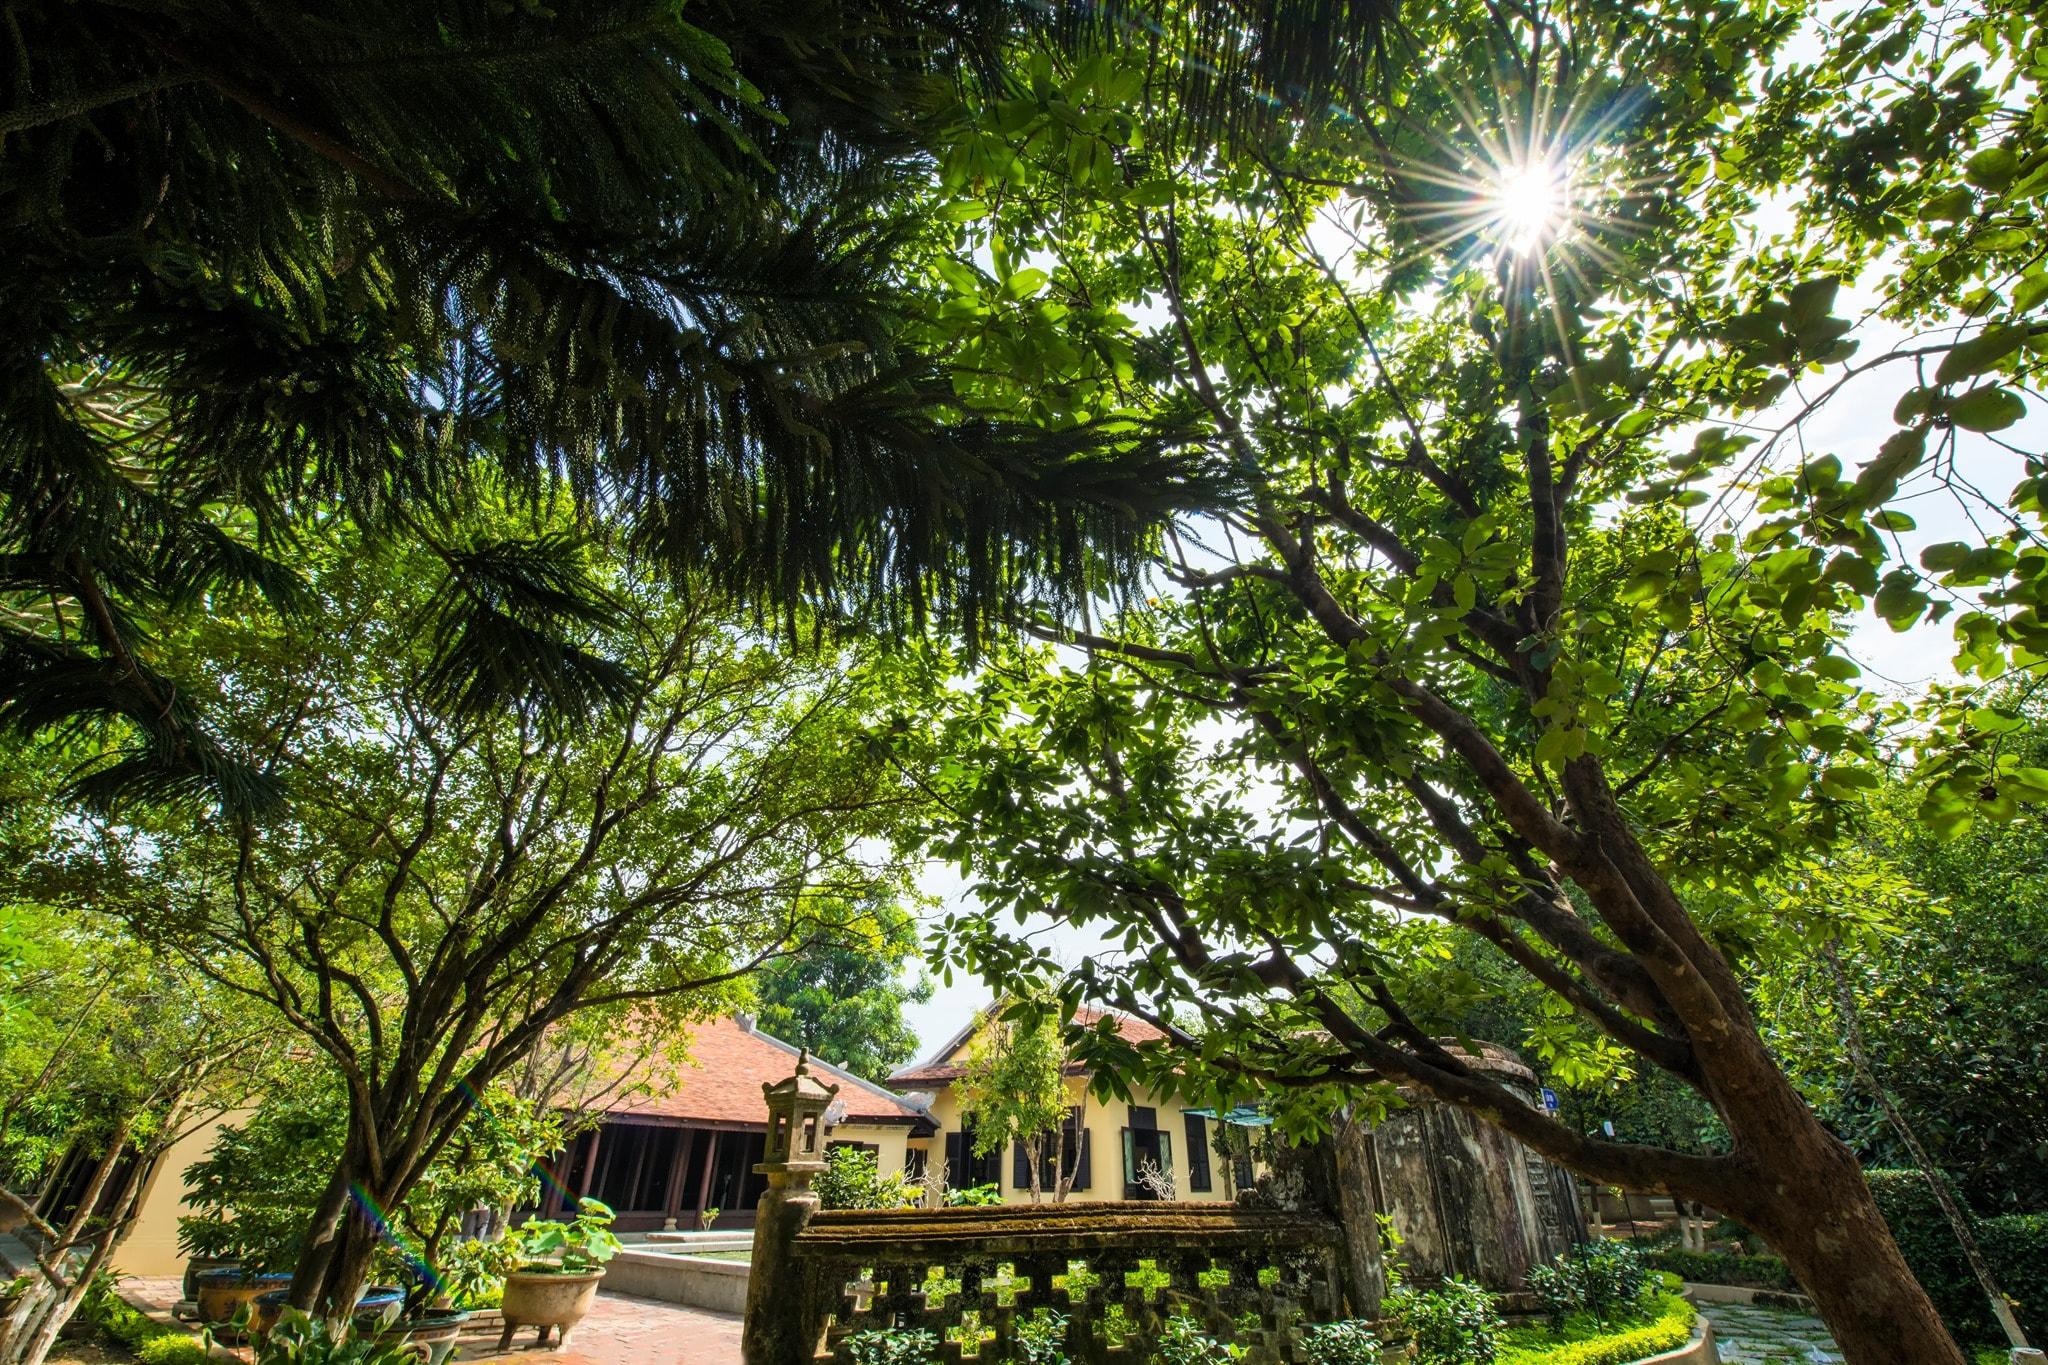 The beautiful garden house Hue